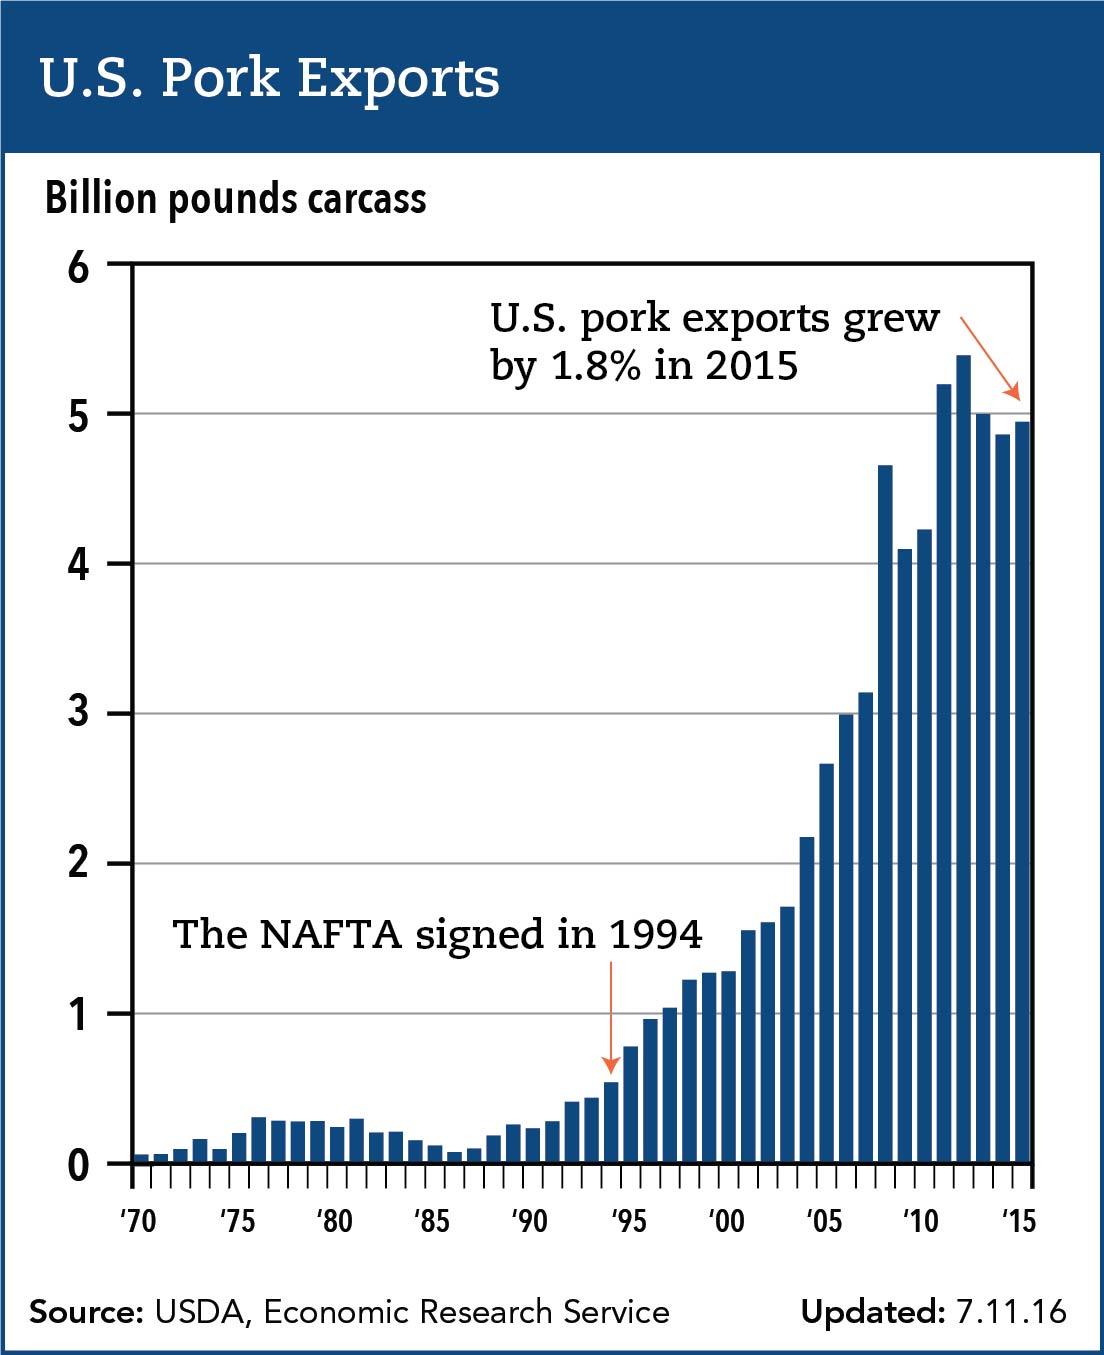 U.S. Pork exports